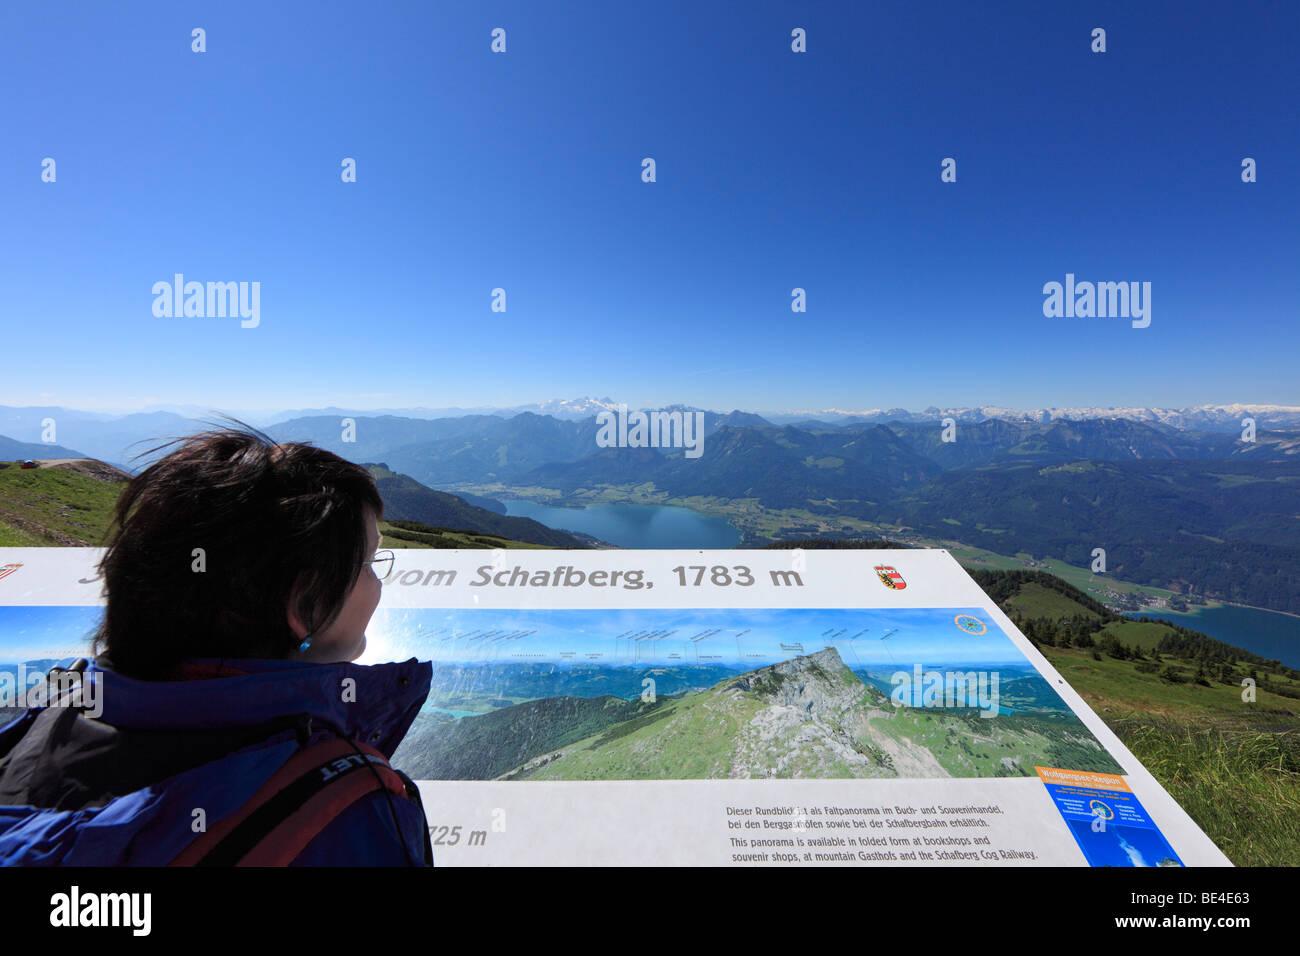 Panoramic map on Mt. Schafberg, Salzkammergut region, Salzburg Land state, Austria, Europe - Stock Image